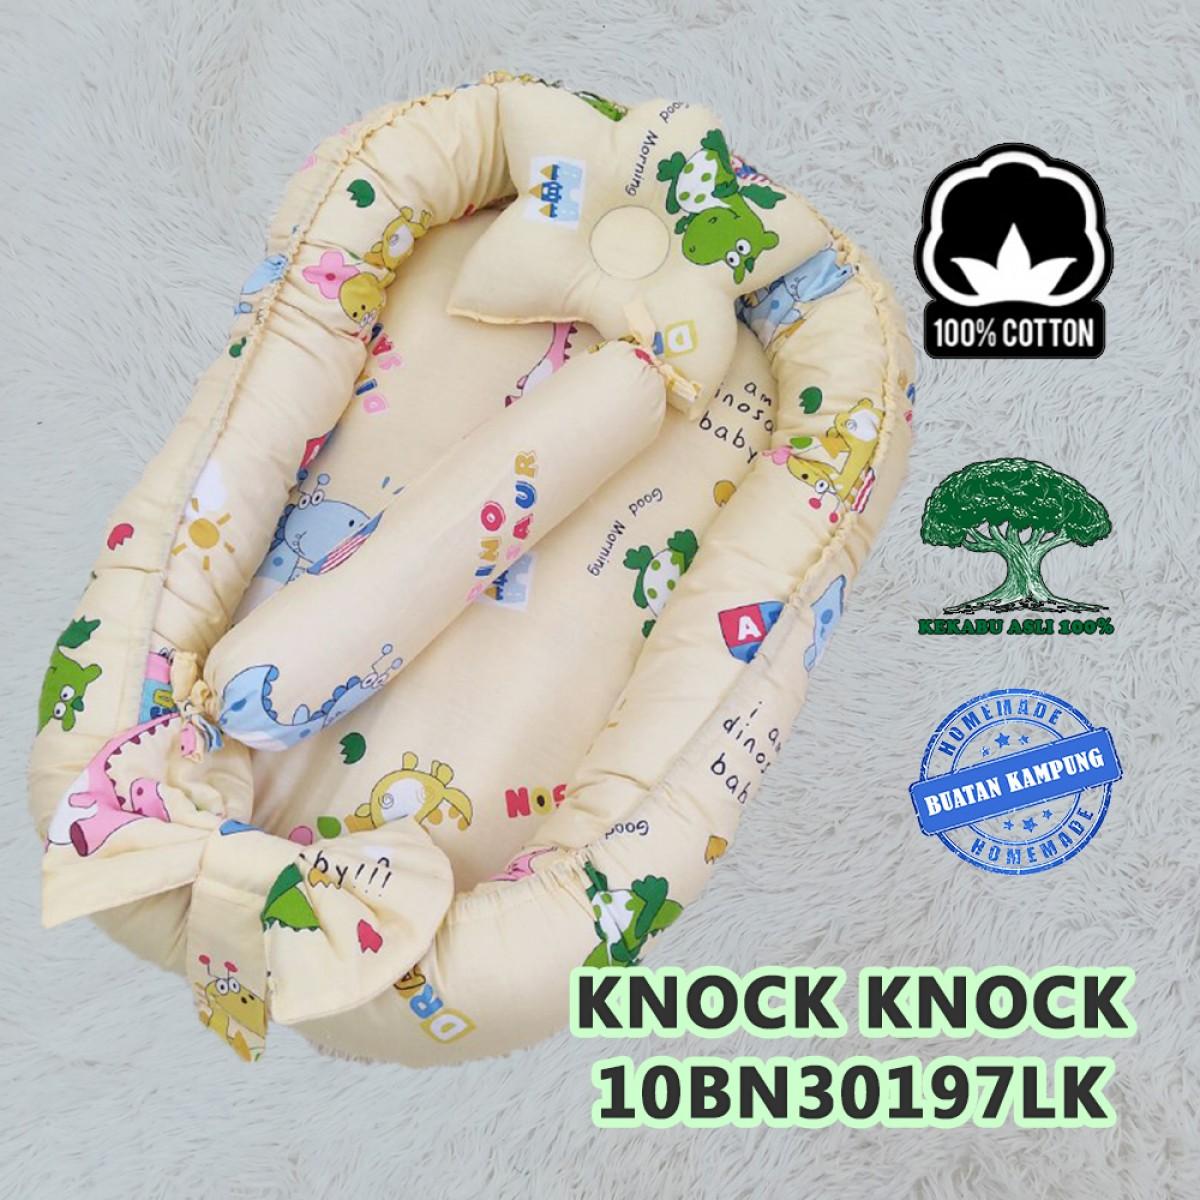 Knock Knock - Kico Baby Center